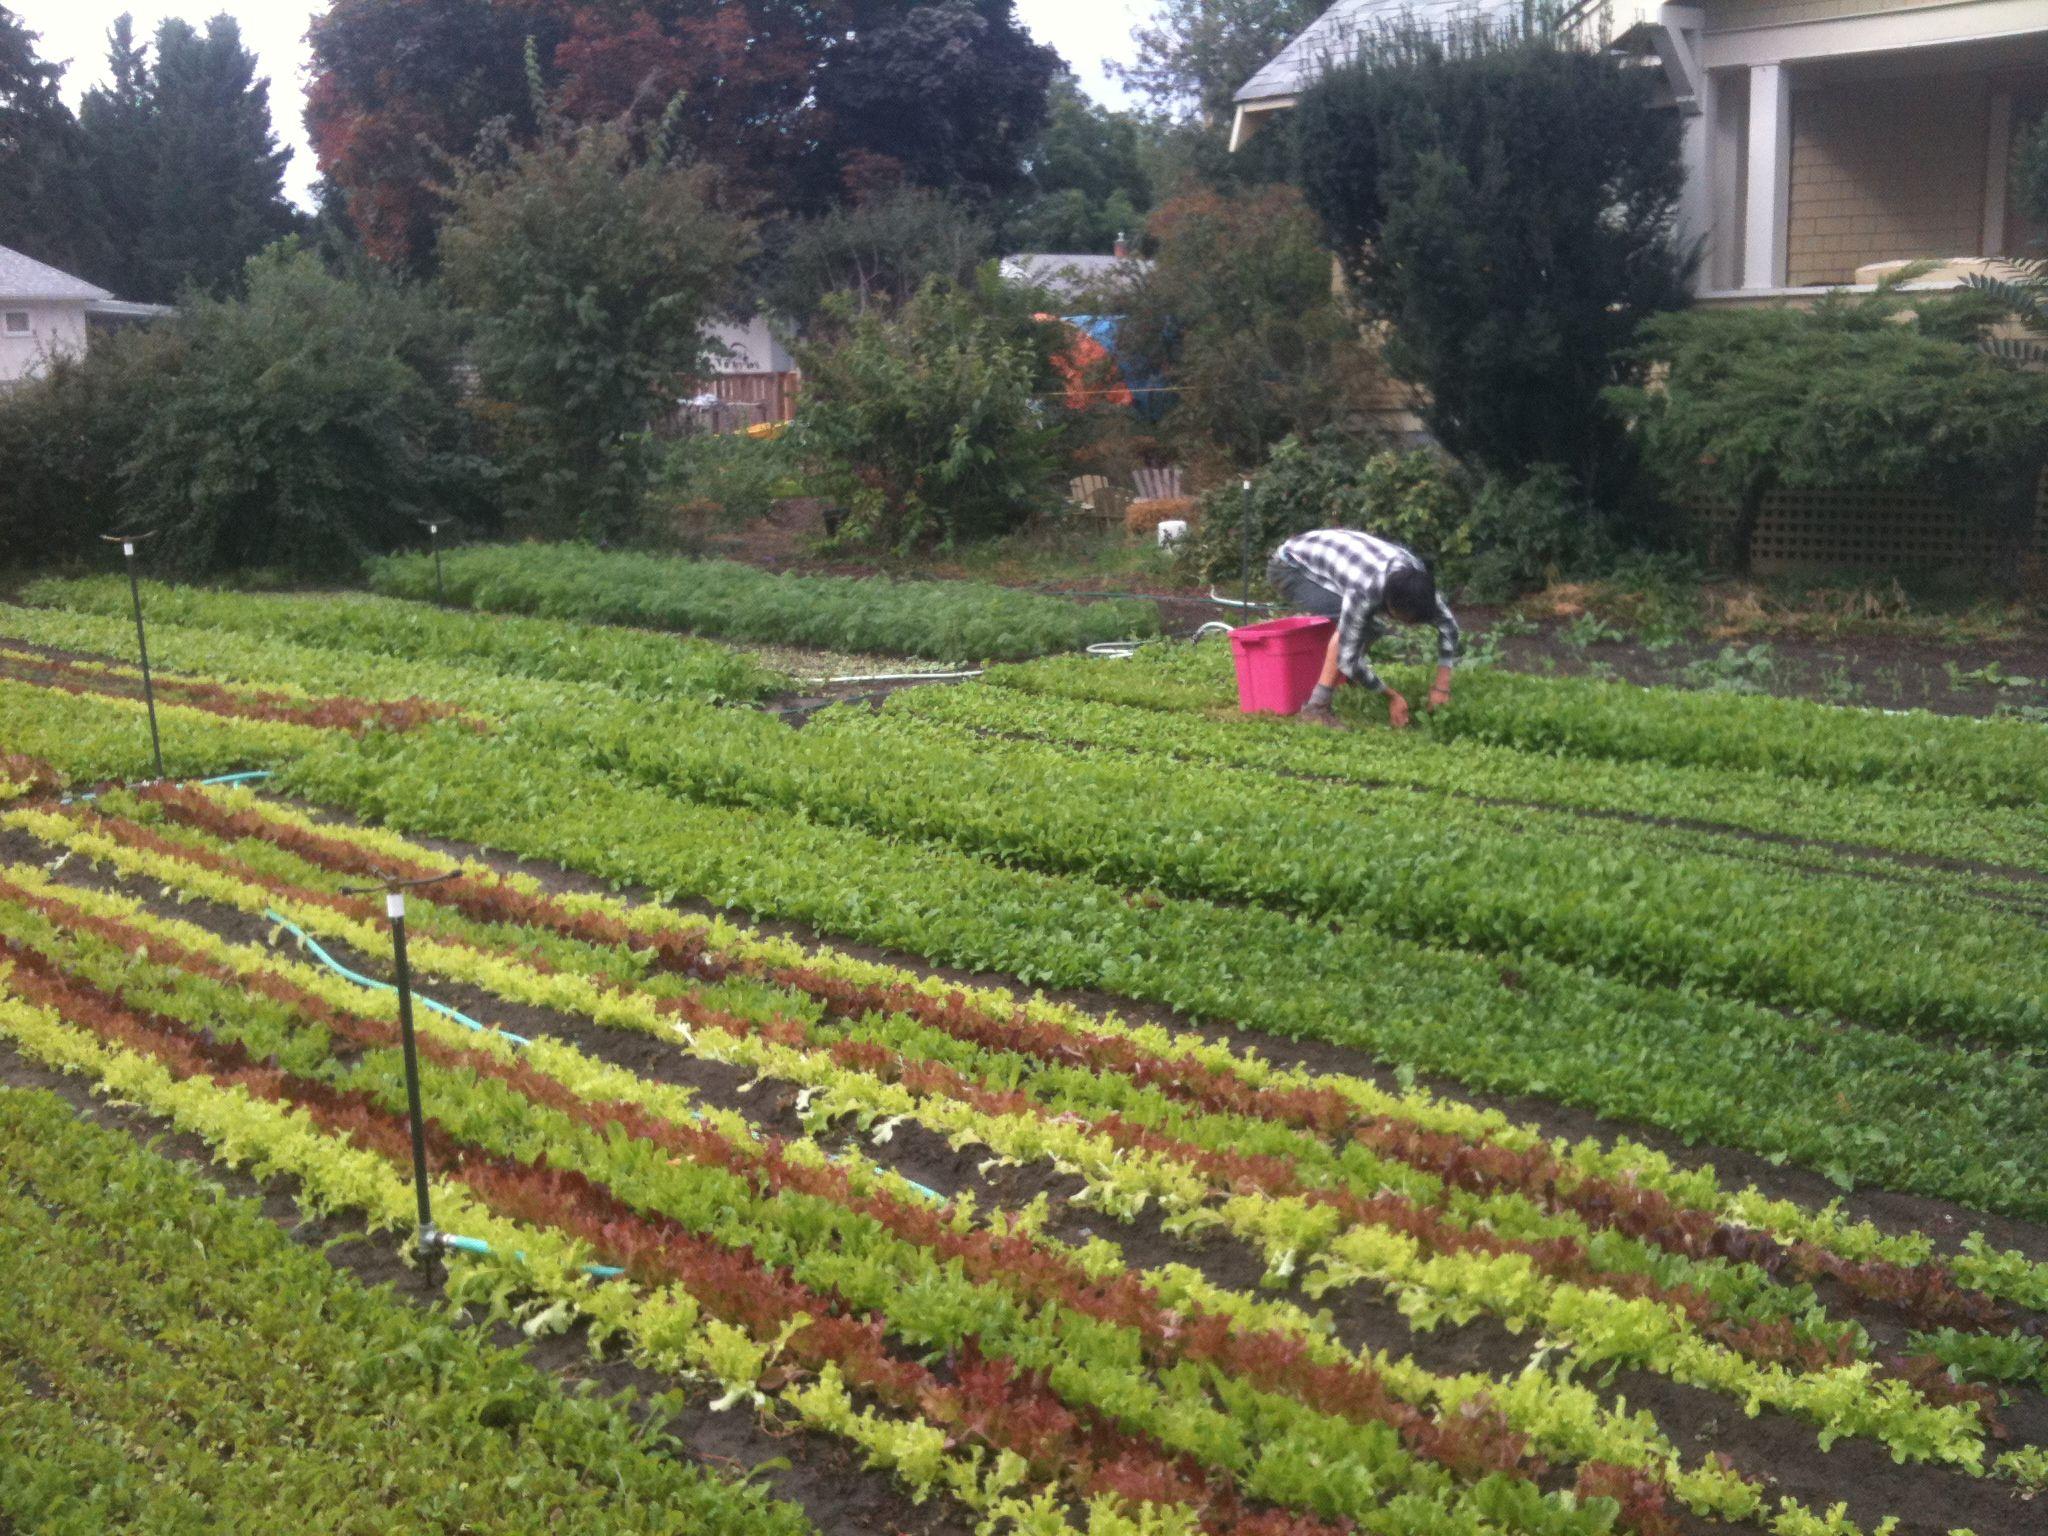 80k Year Farming On 1 3 Acre Square Foot Gardening Meets Commercial Farming Urban Farmer Commercial Farming Sustainable Garden Design